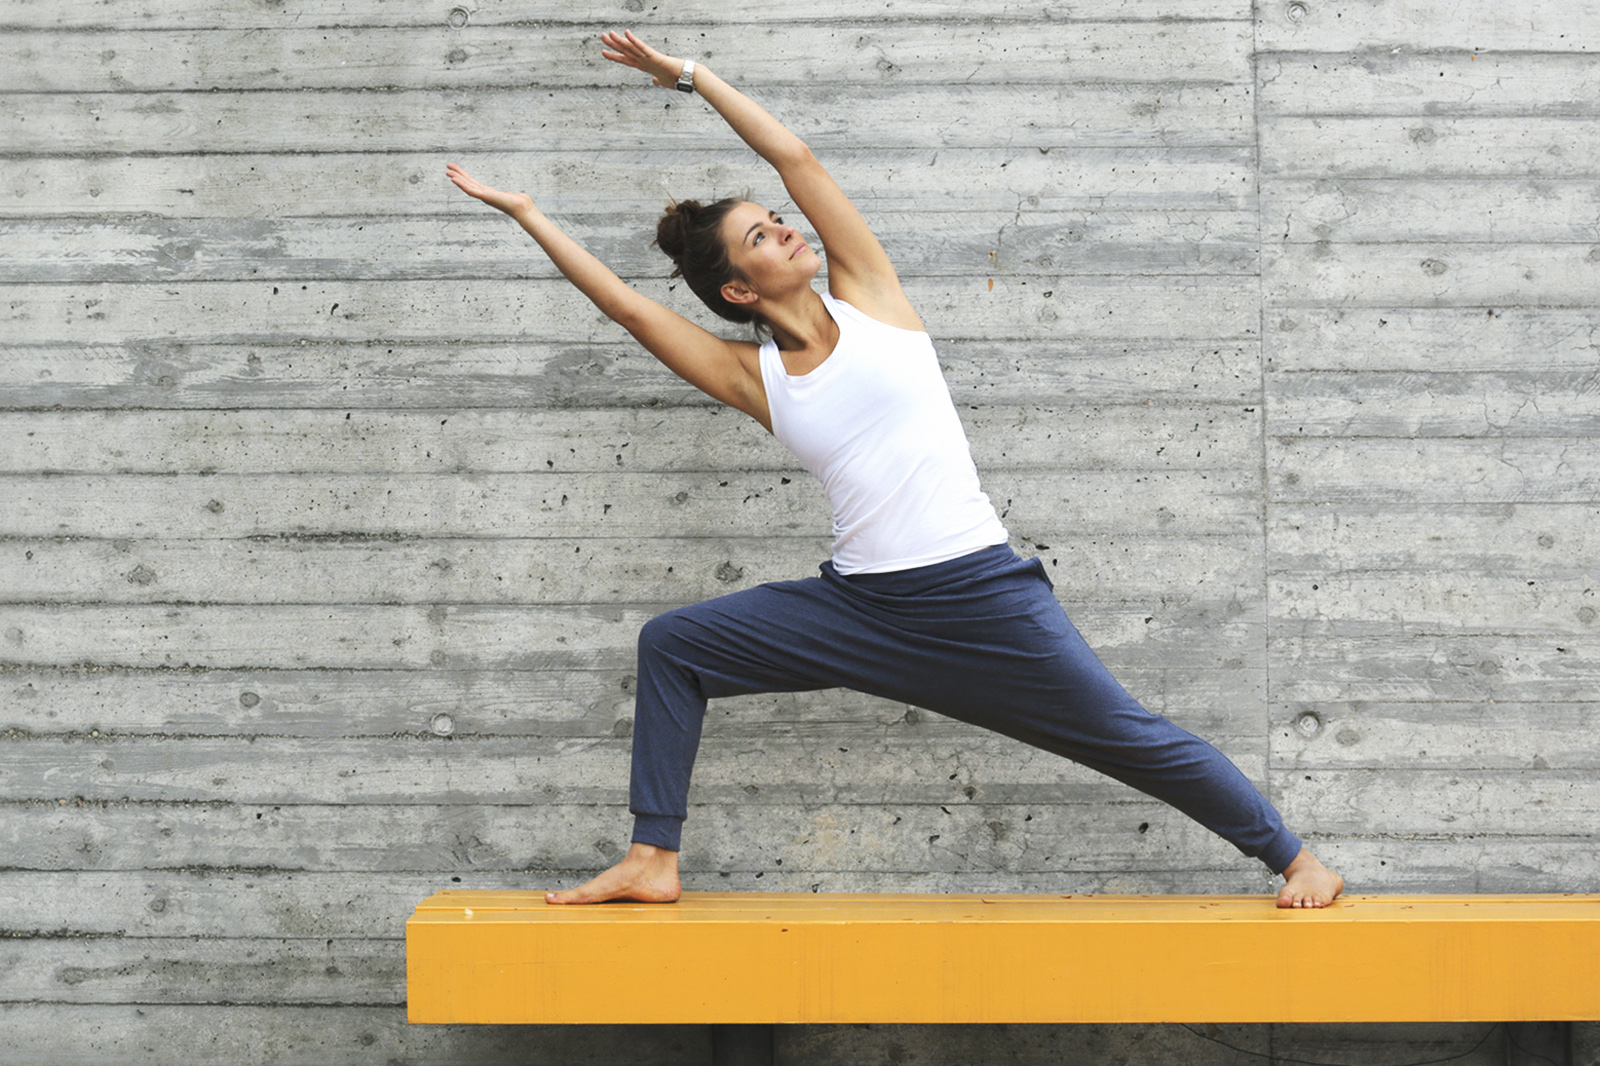 Mady_Morrison_Yogalehrer_Berlin_Youtube_2